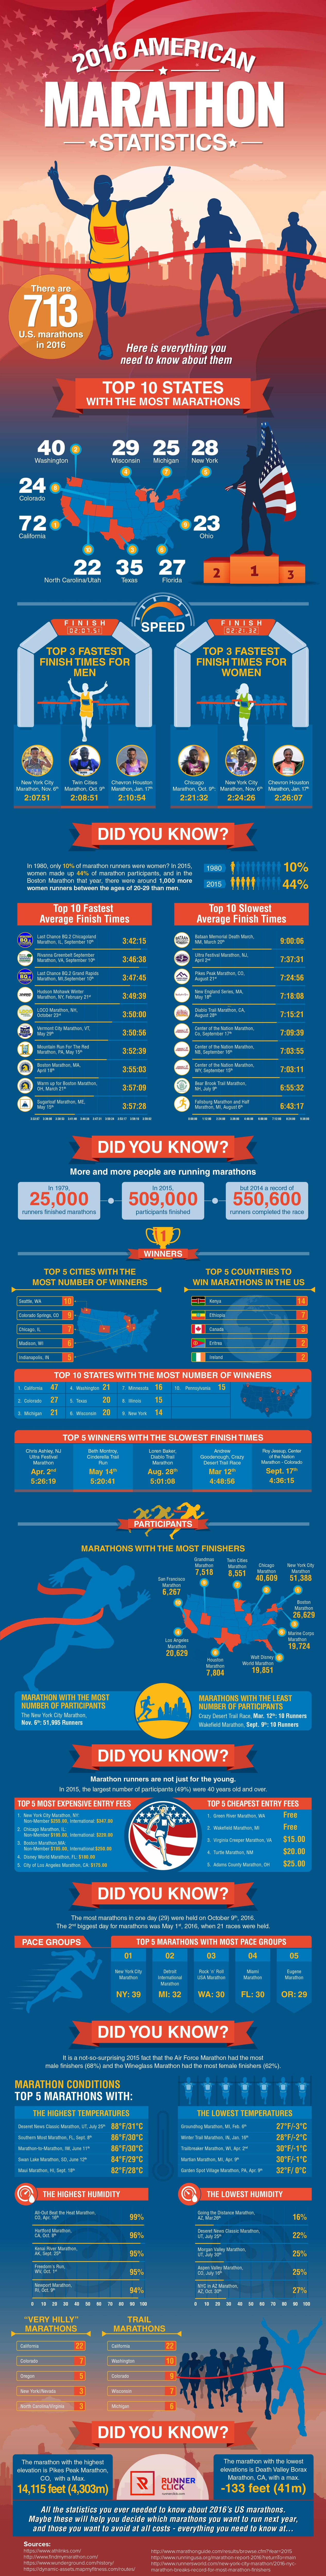 Statistics of 2016 American Marathon